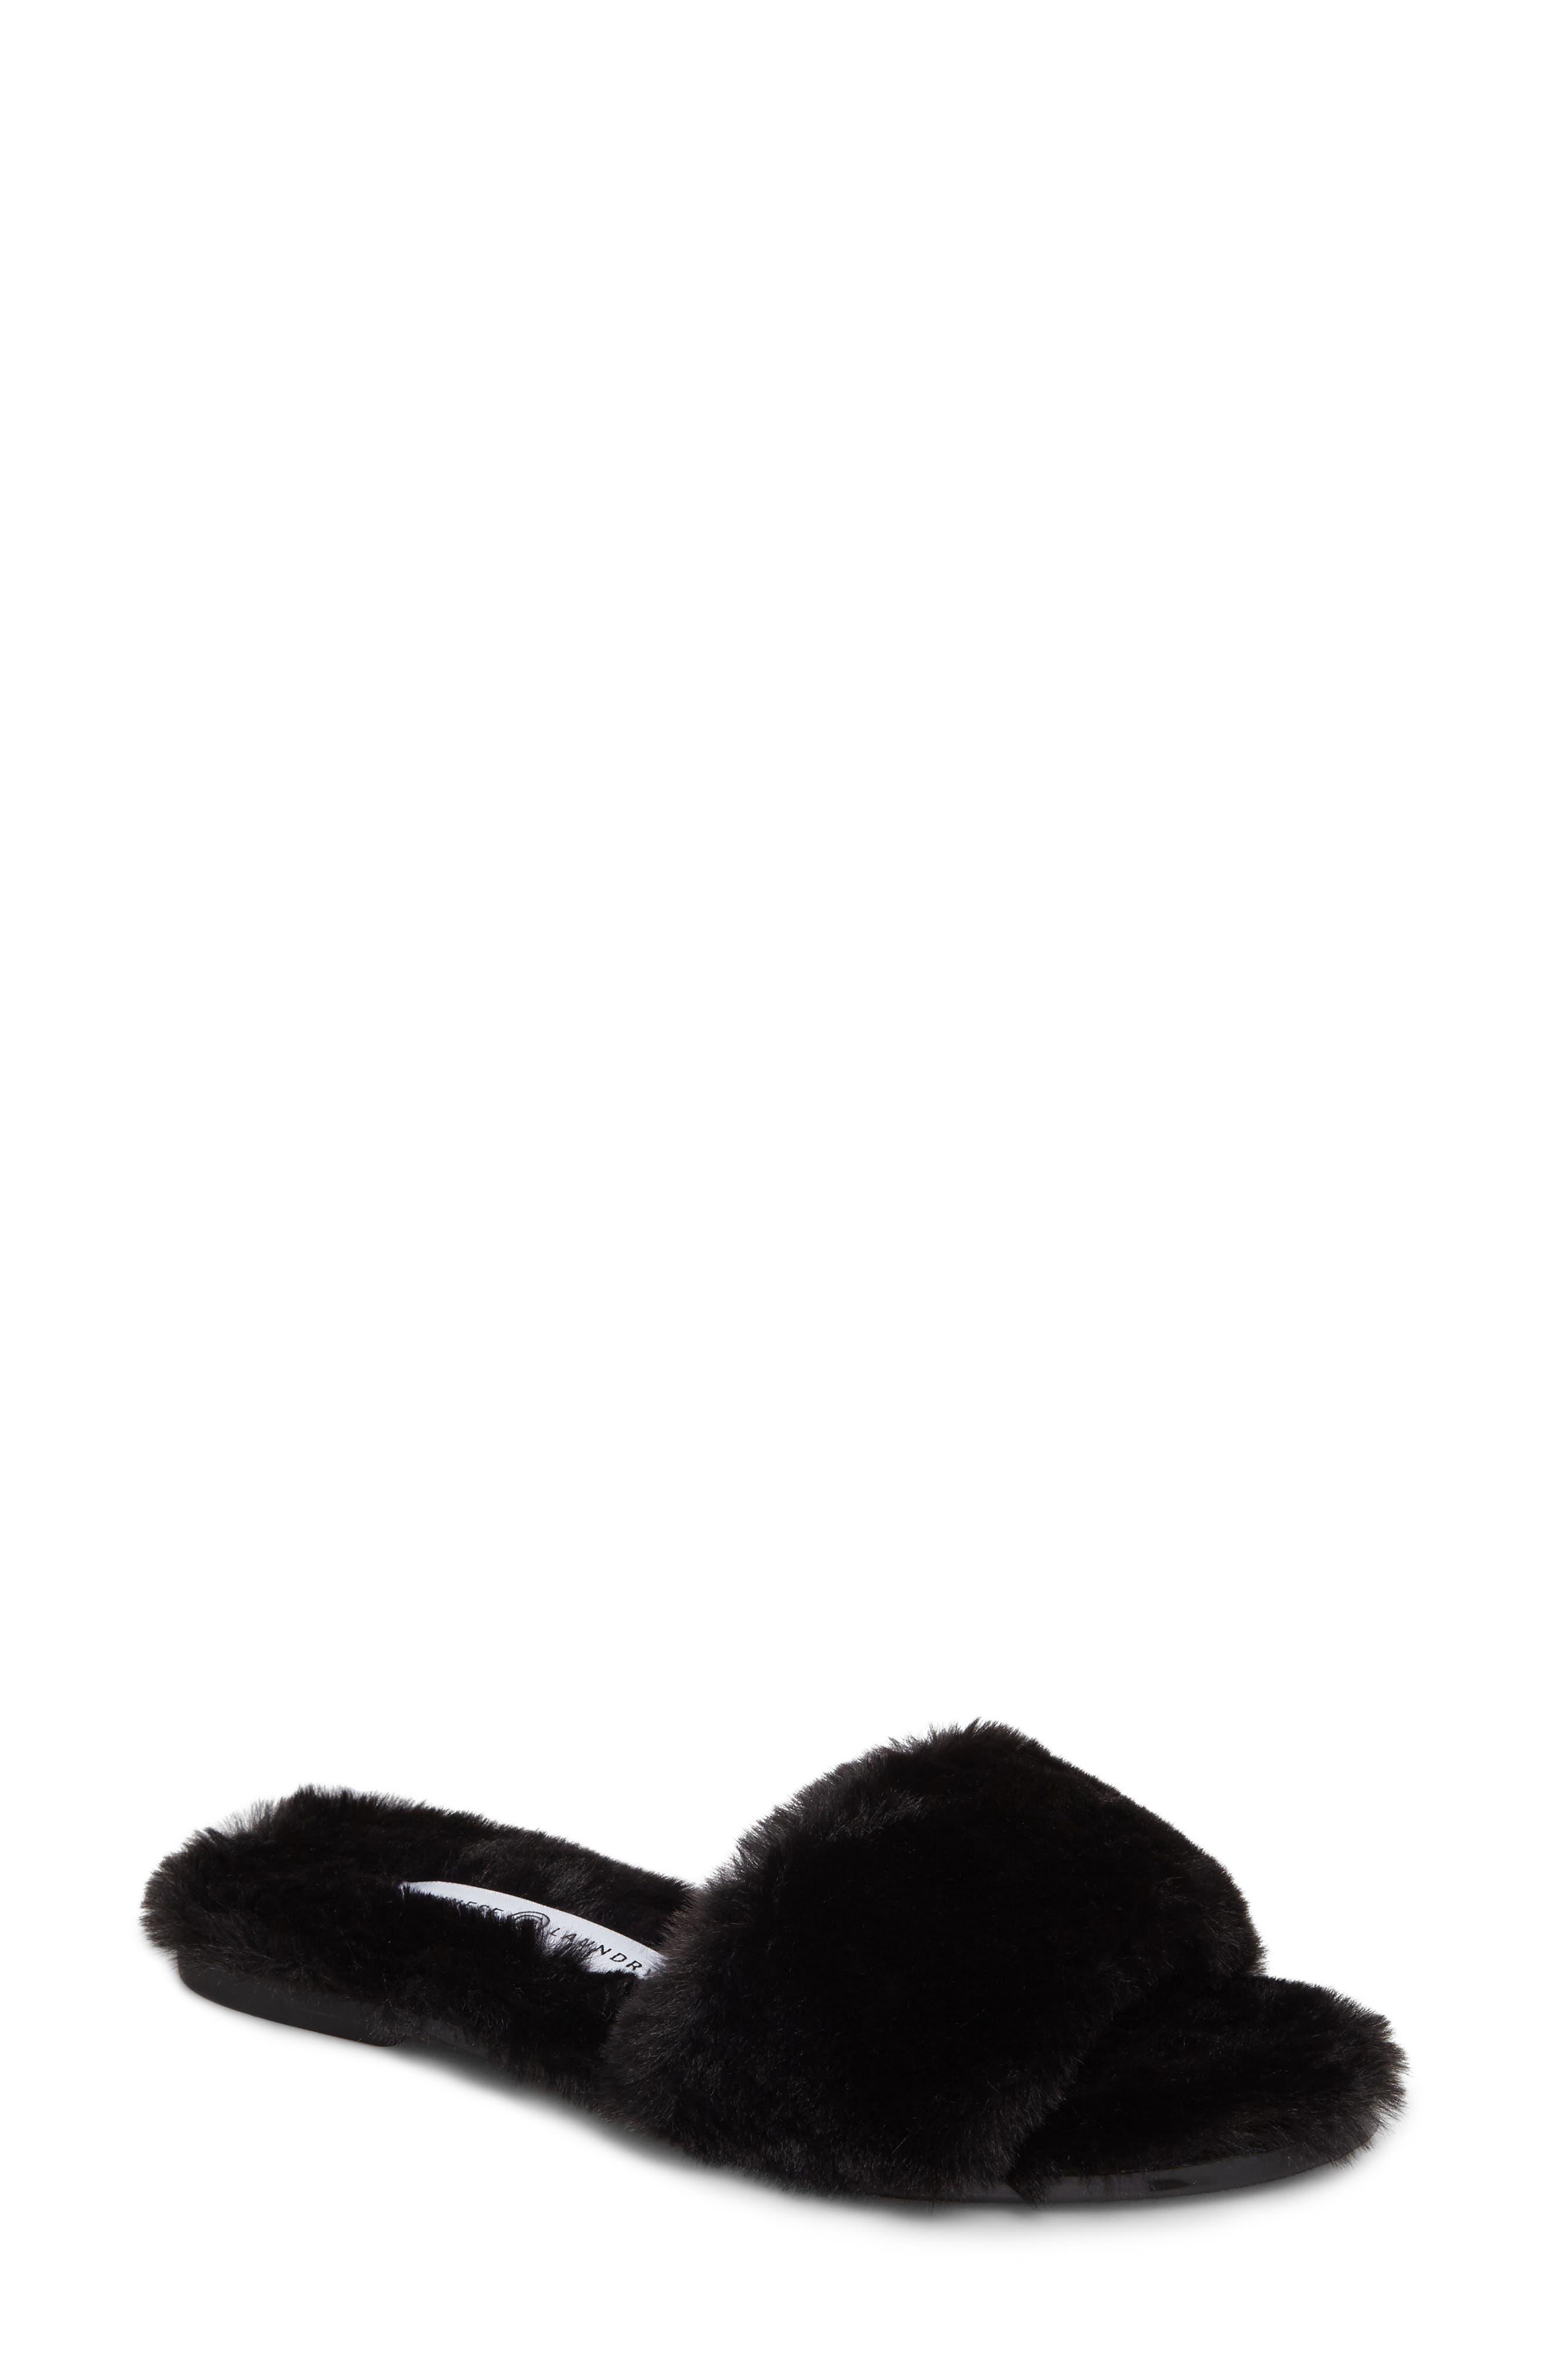 Mulholland Faux Fur Slide Sandal,                             Main thumbnail 1, color,                             001